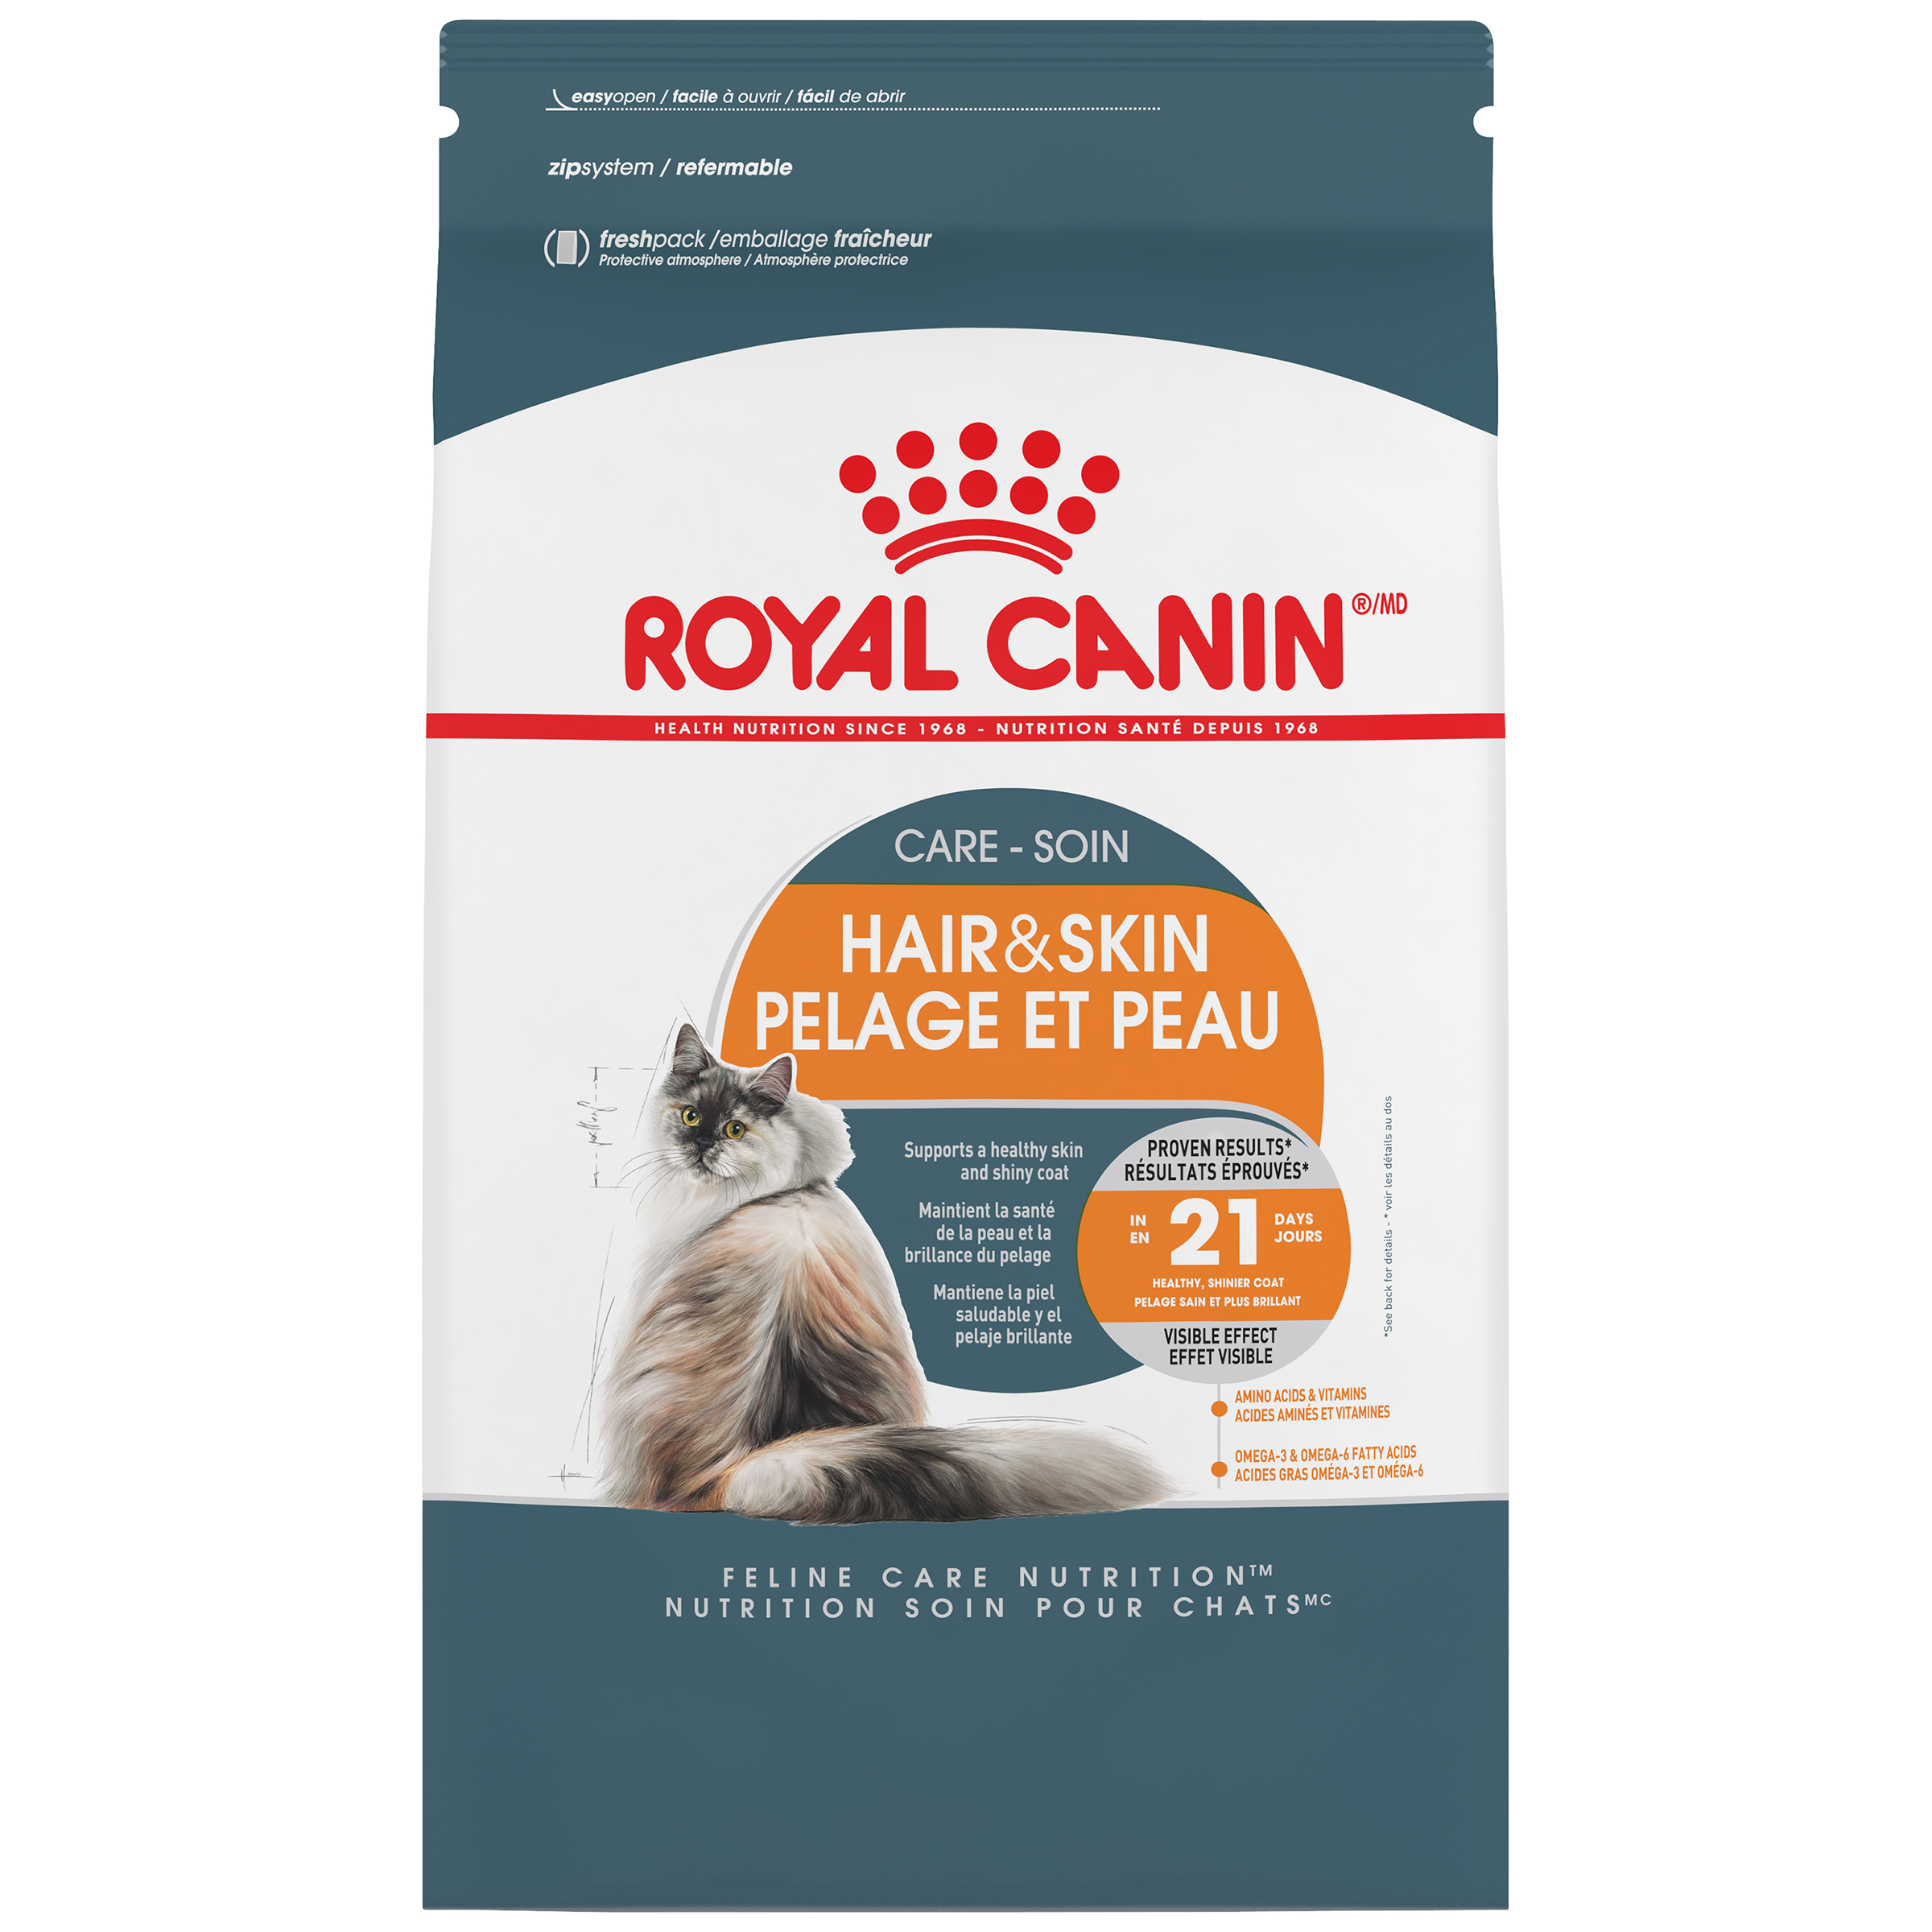 Royal Canin Feline Care Nutrition Hair & Skin Care Adult Dry Cat Food Image